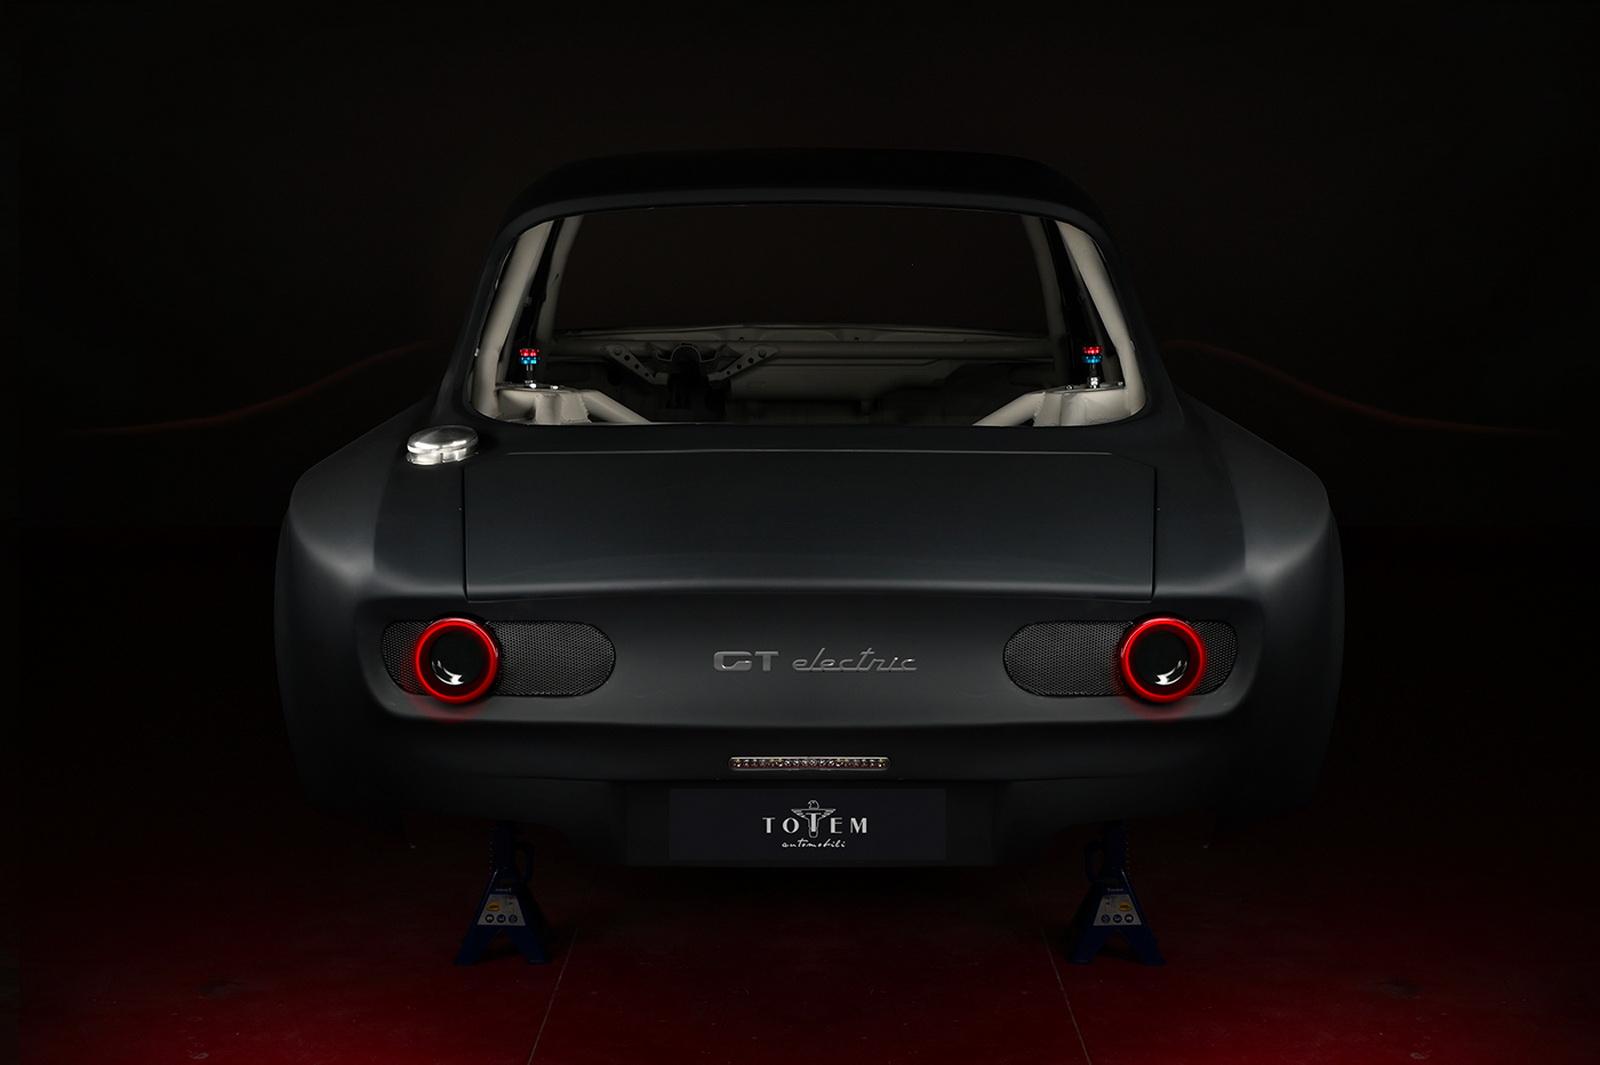 Alfa-Romeo-Giulia-GTelectric-by-Totem-Automobili-3